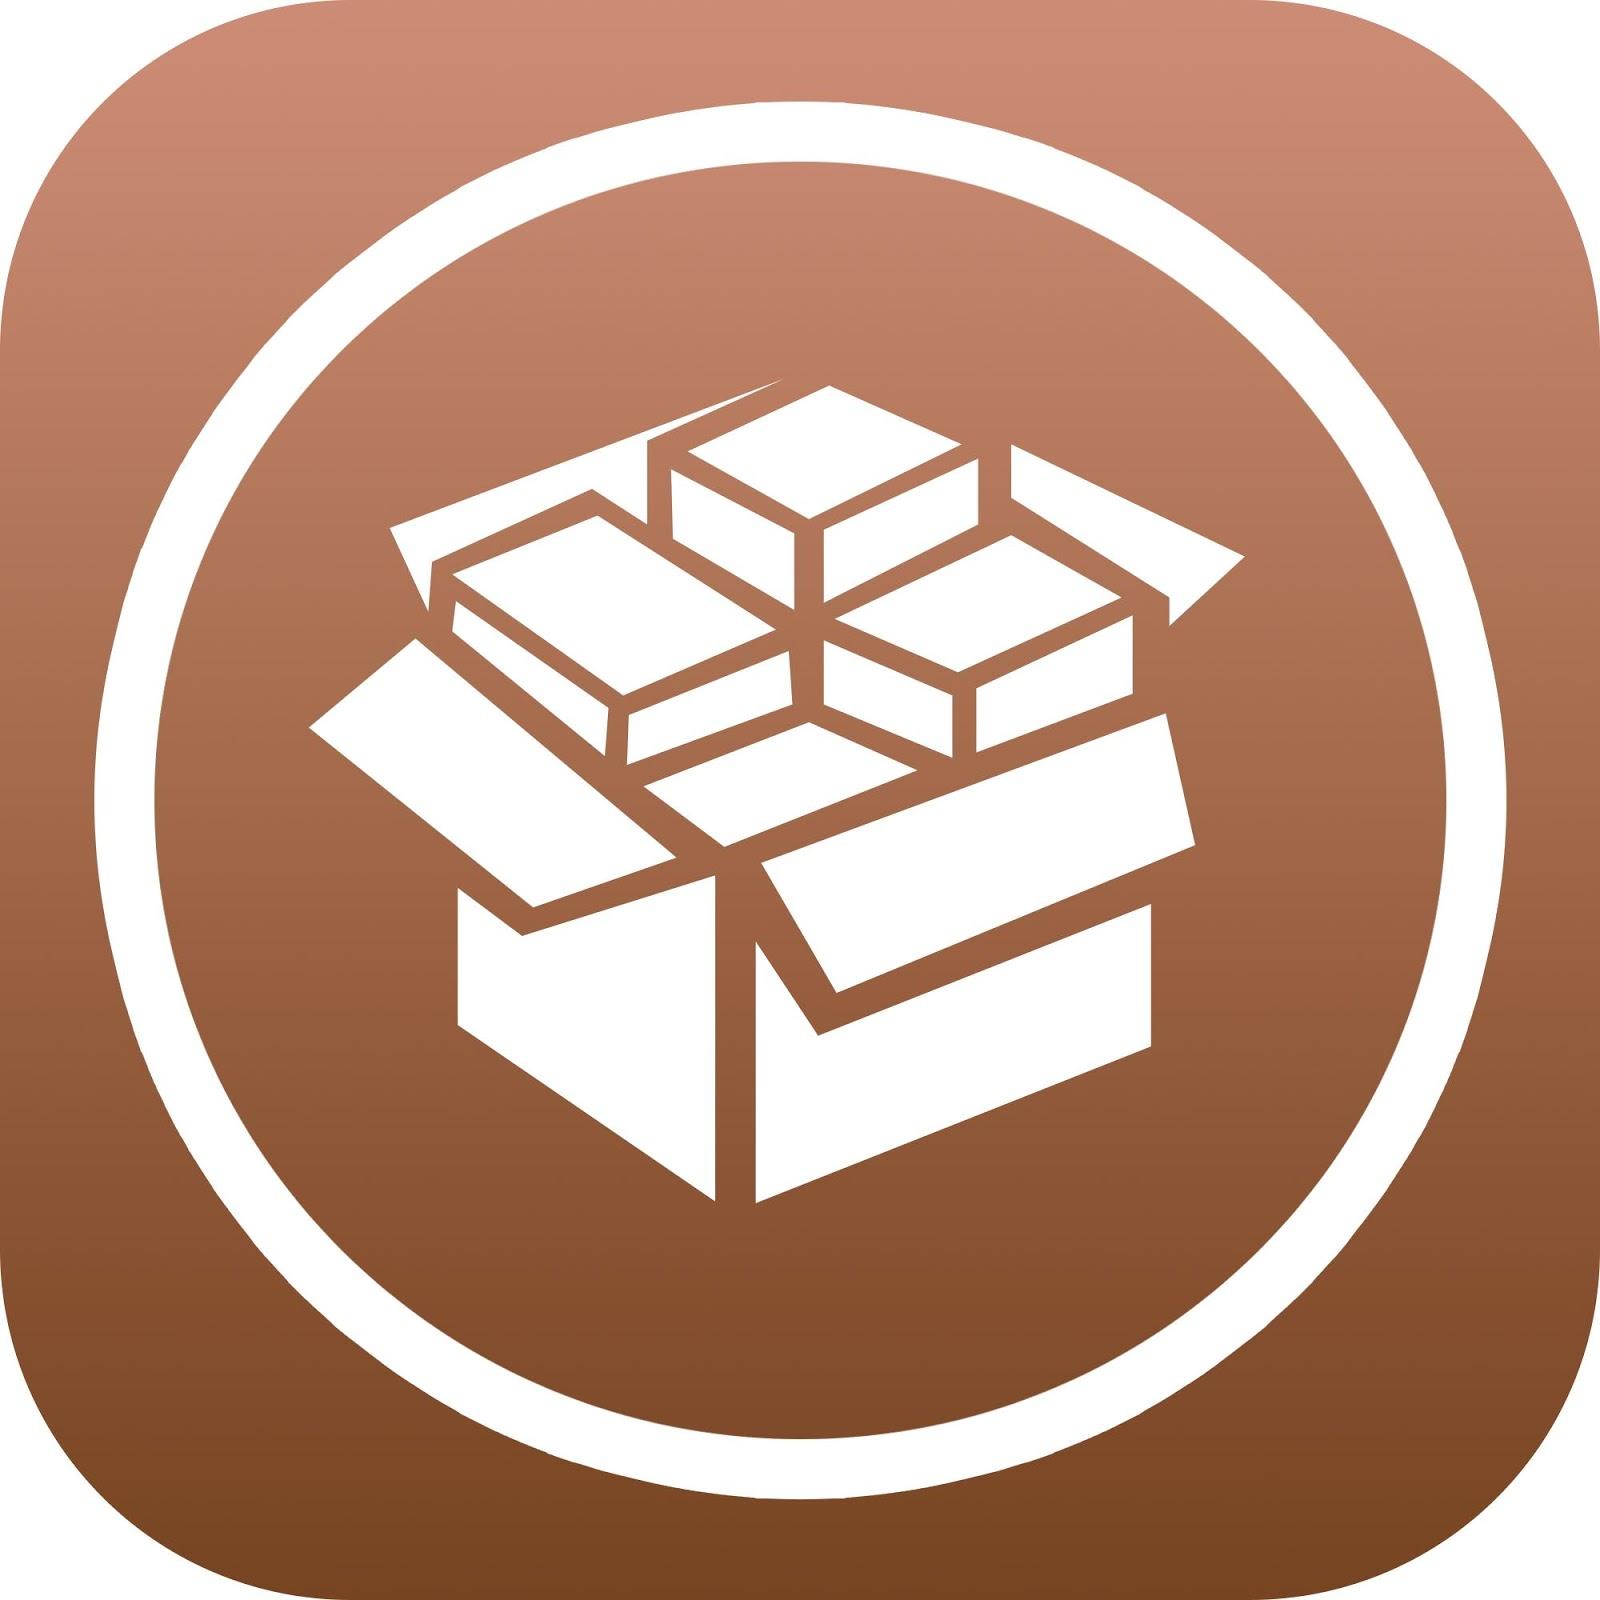 Fifa 14 full version ios (non-jailbreak) | iOScrunch